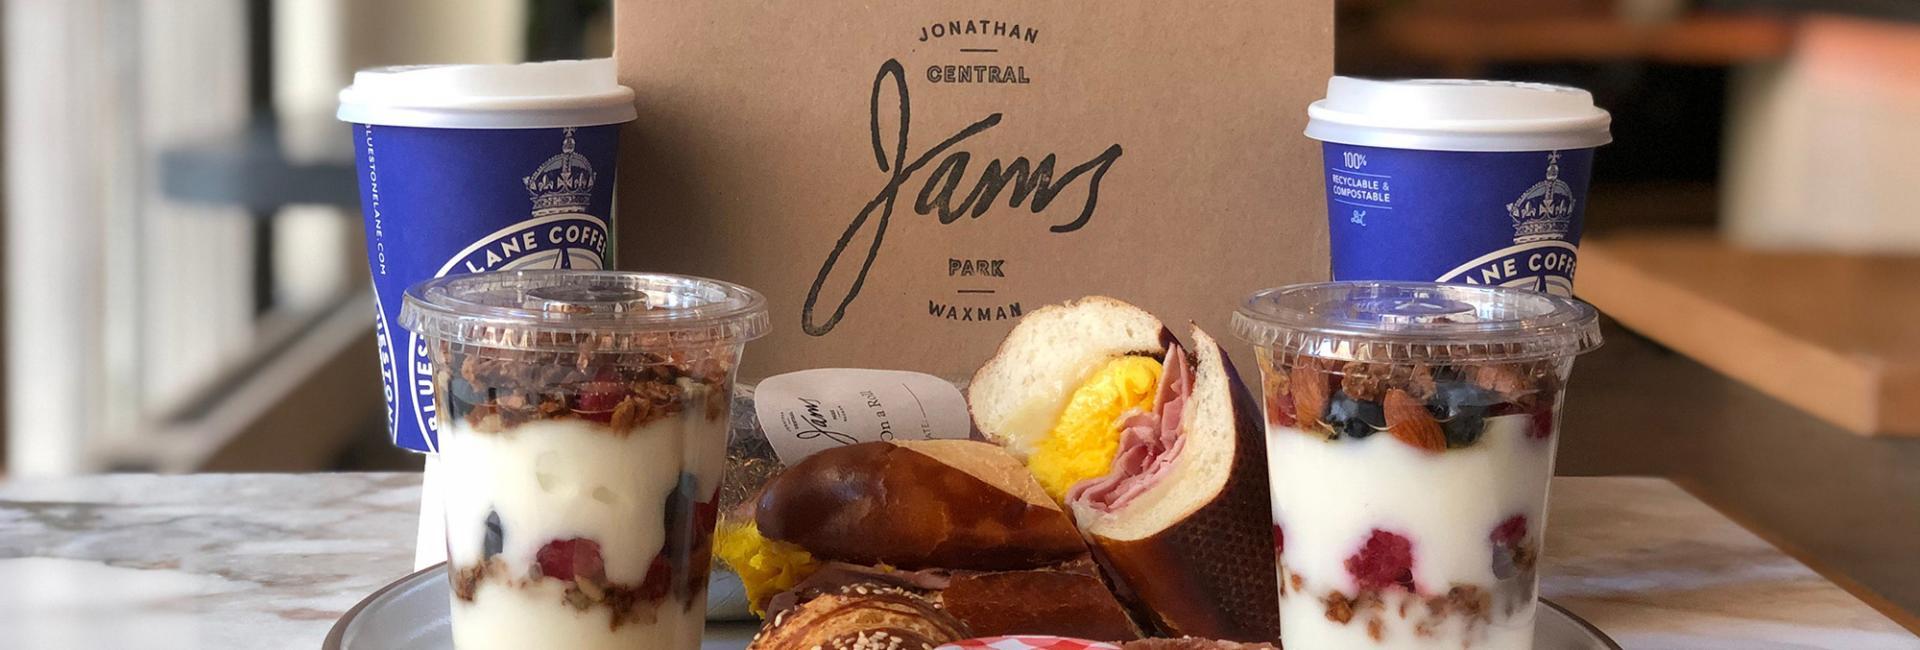 Jams Cafe Breakfast Box